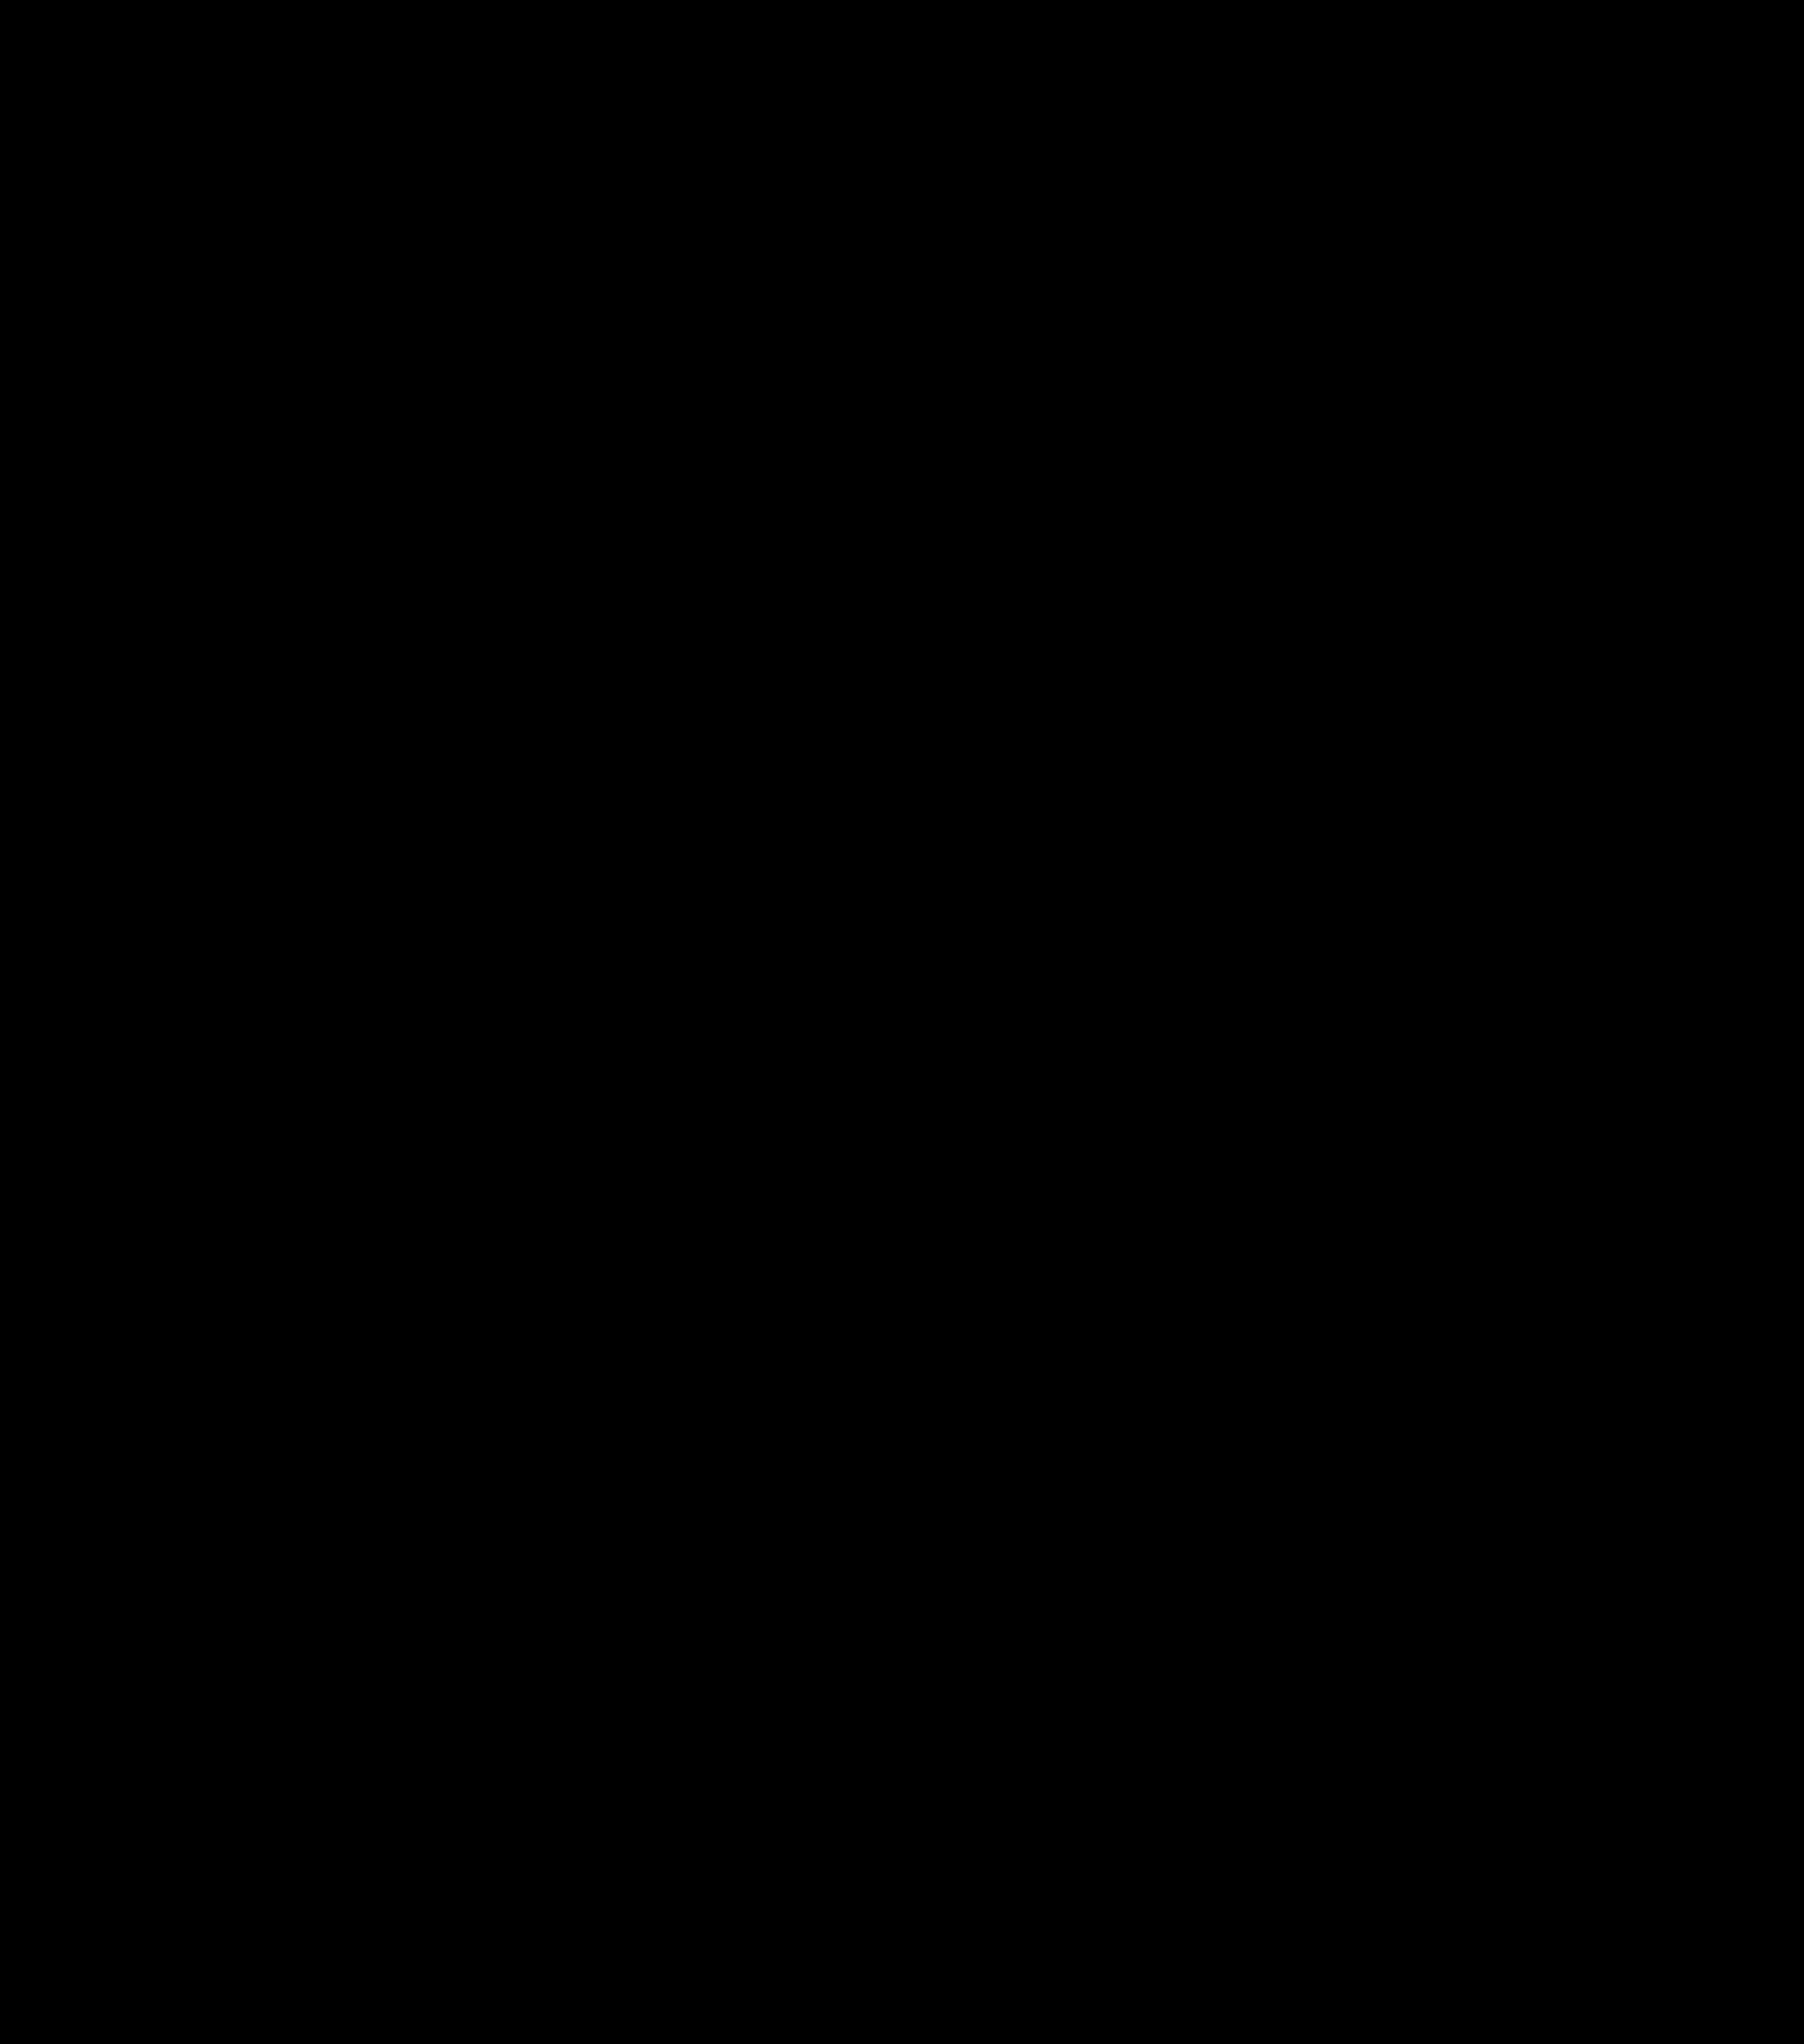 2118x2400 Black Clipart Calendar